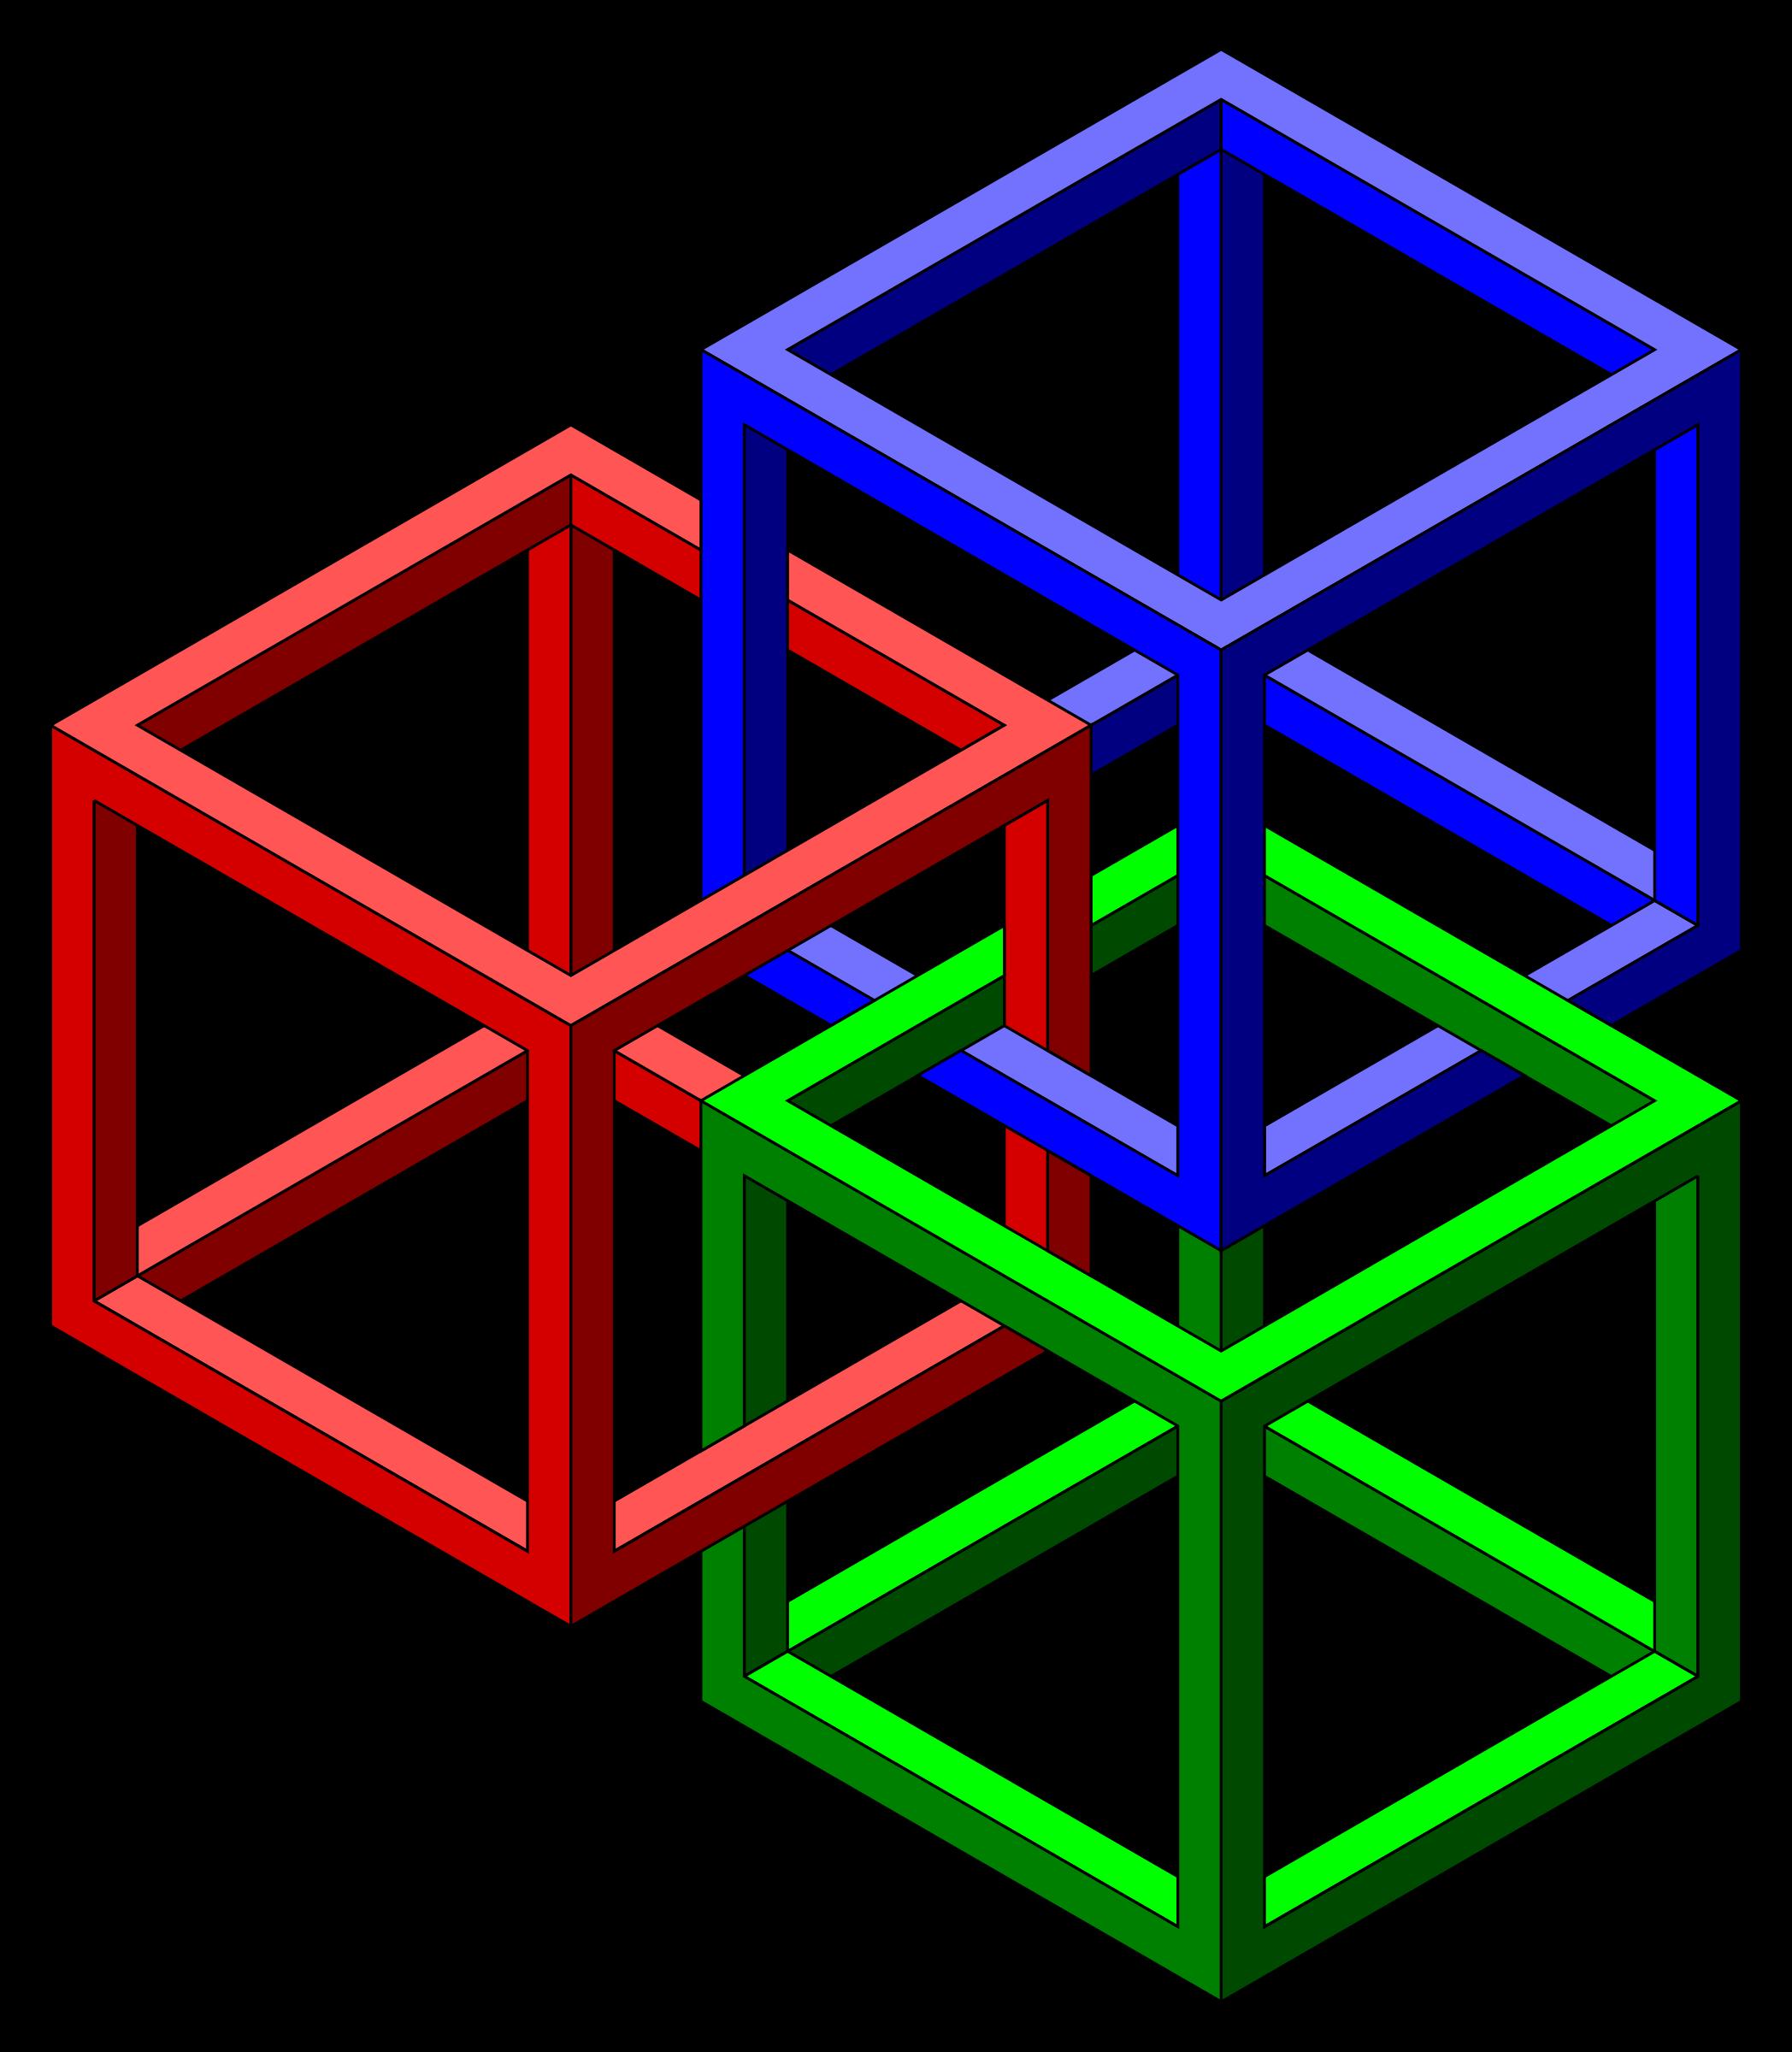 Clipart math geometry. Desktop backgrounds impossible cubes